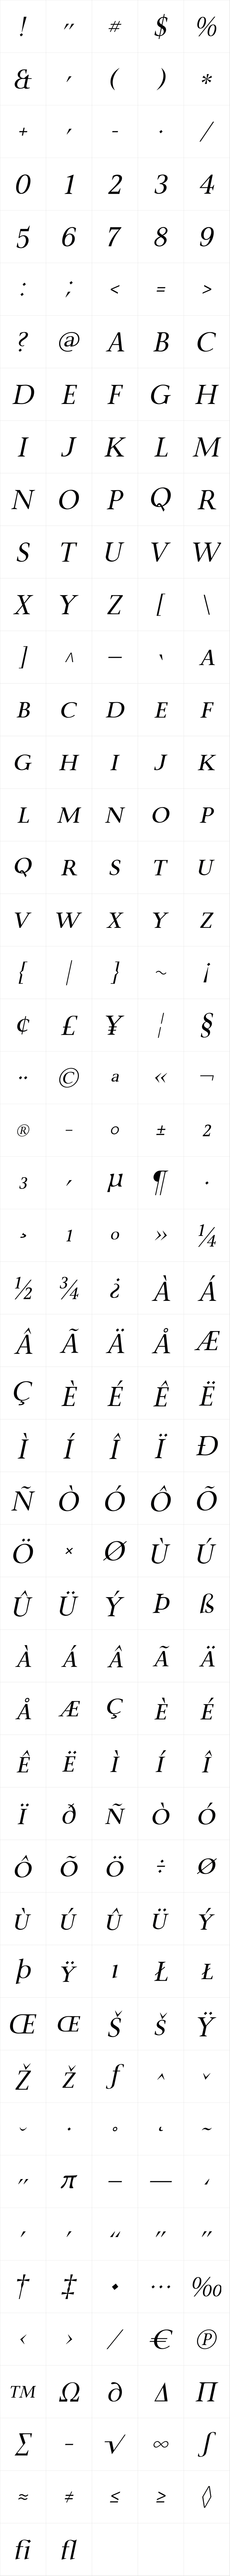 P22 Mai Italic Small Caps